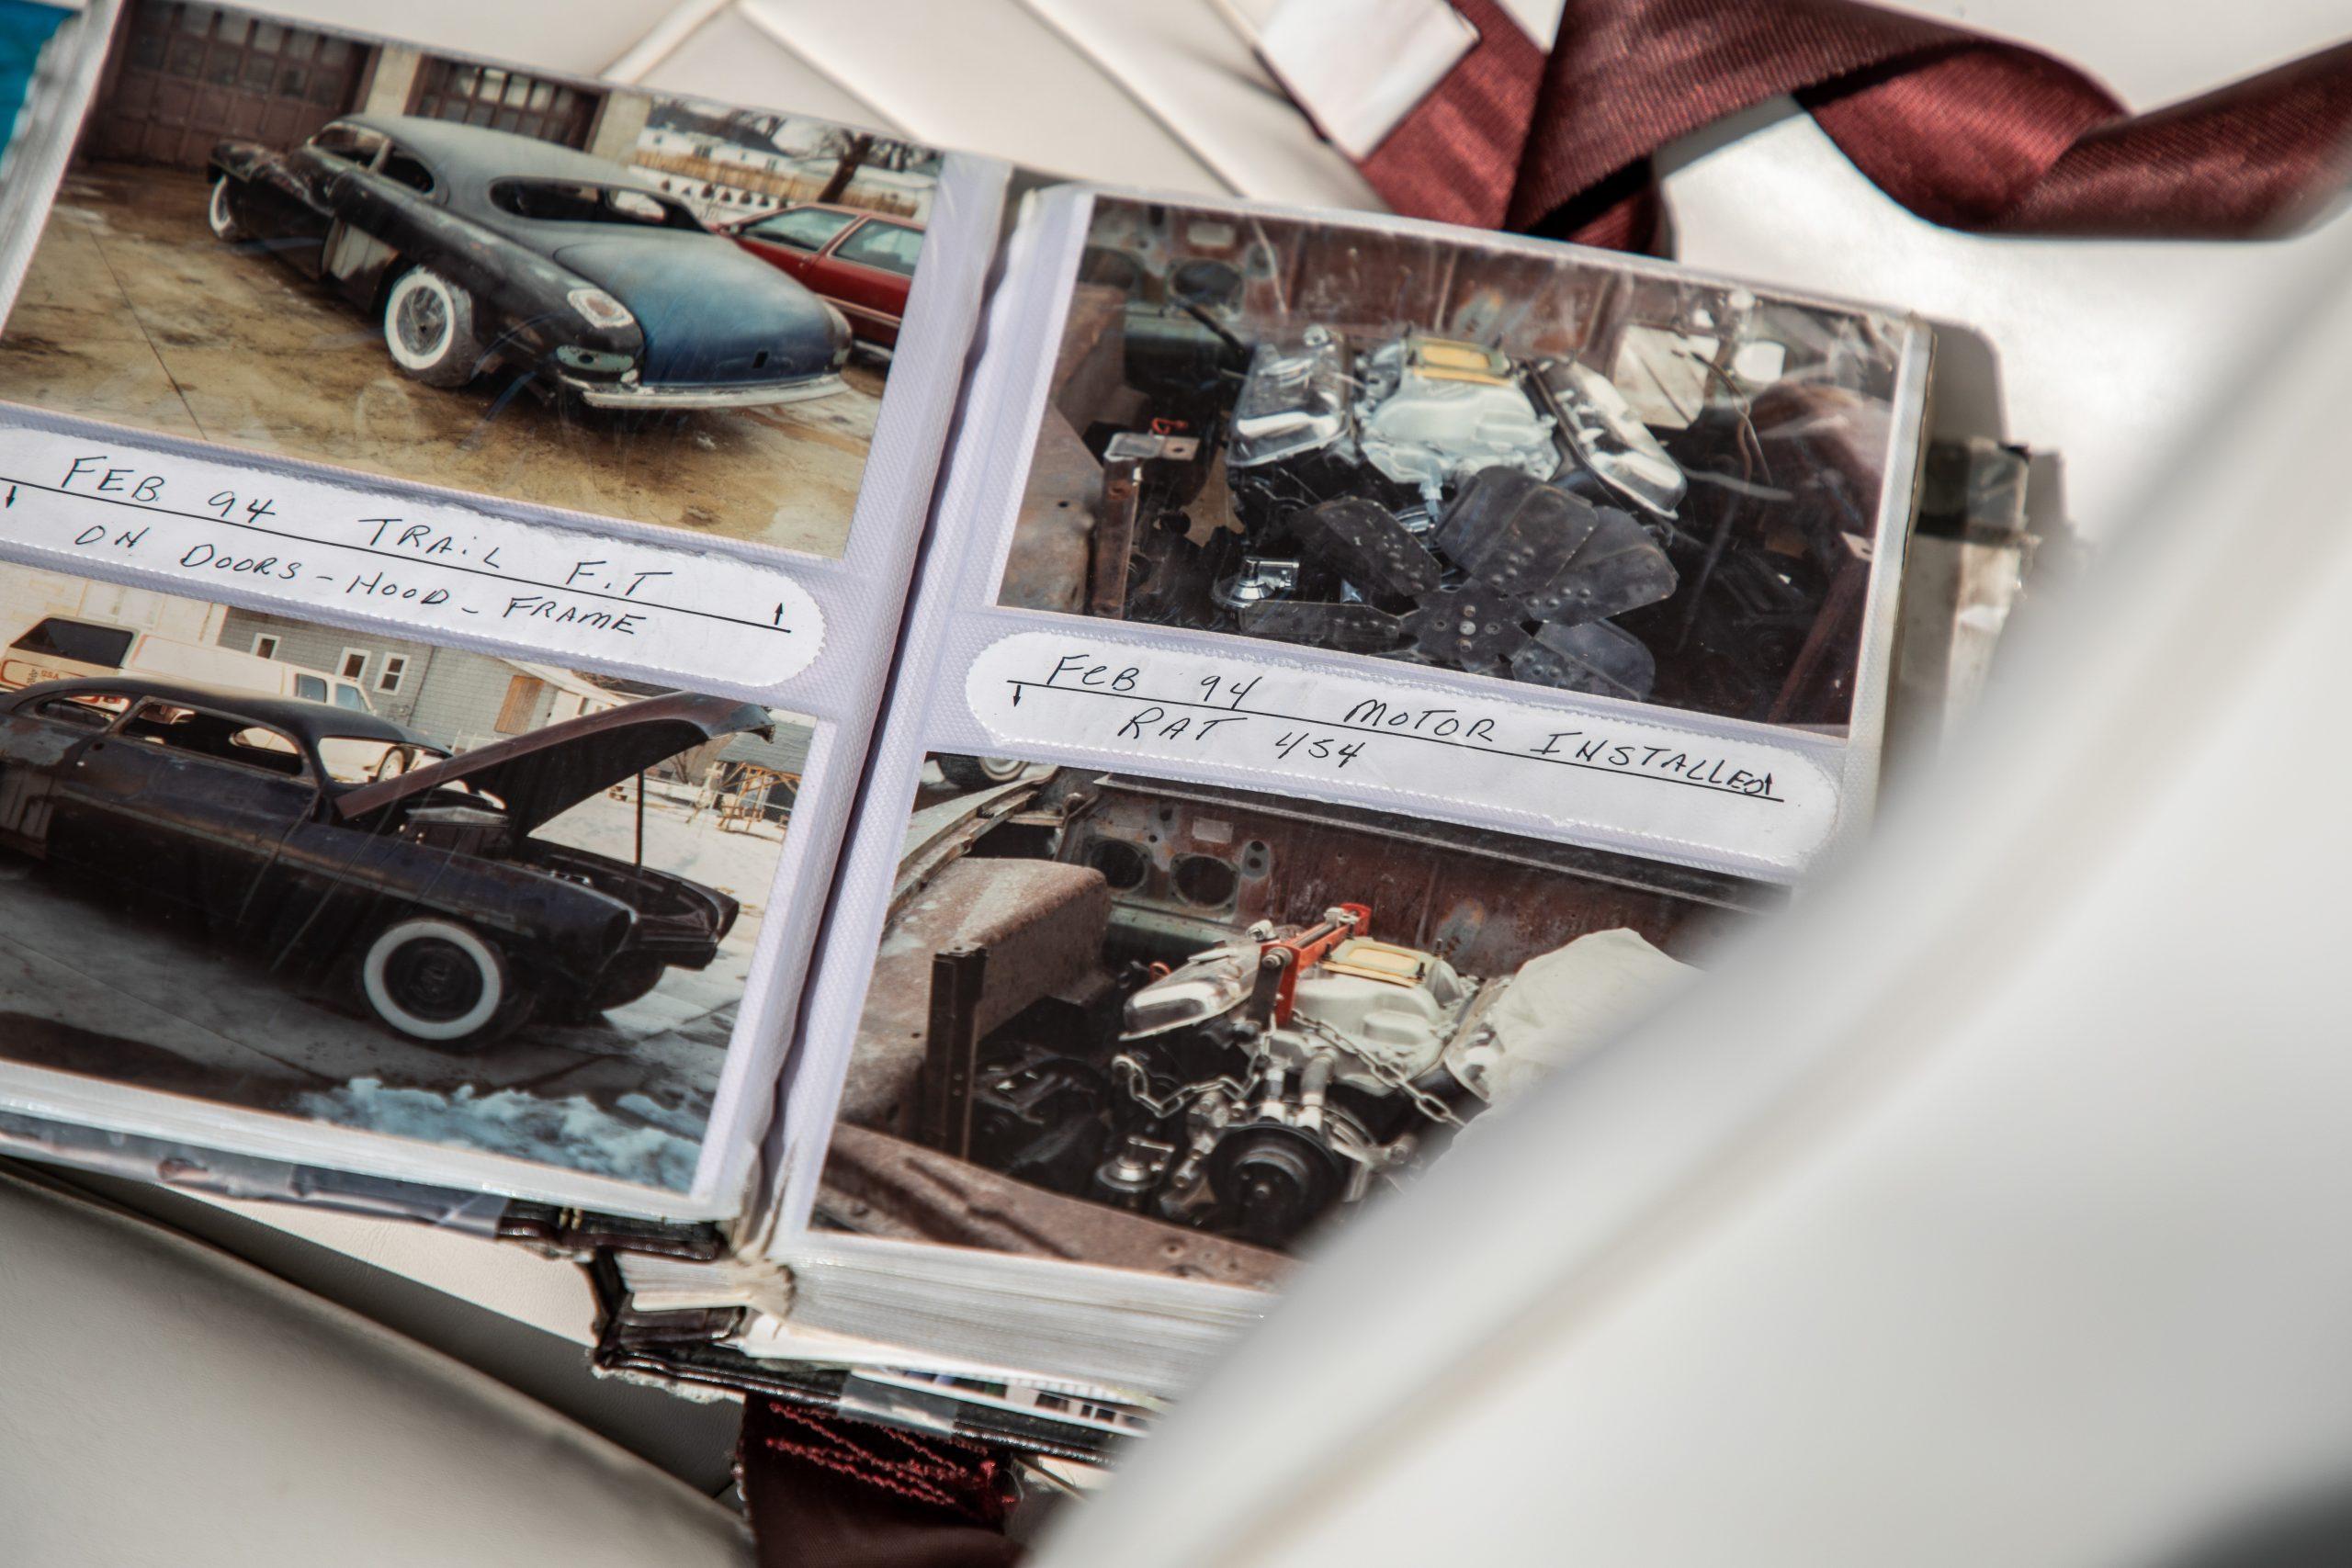 mercury lead sled custom photo history